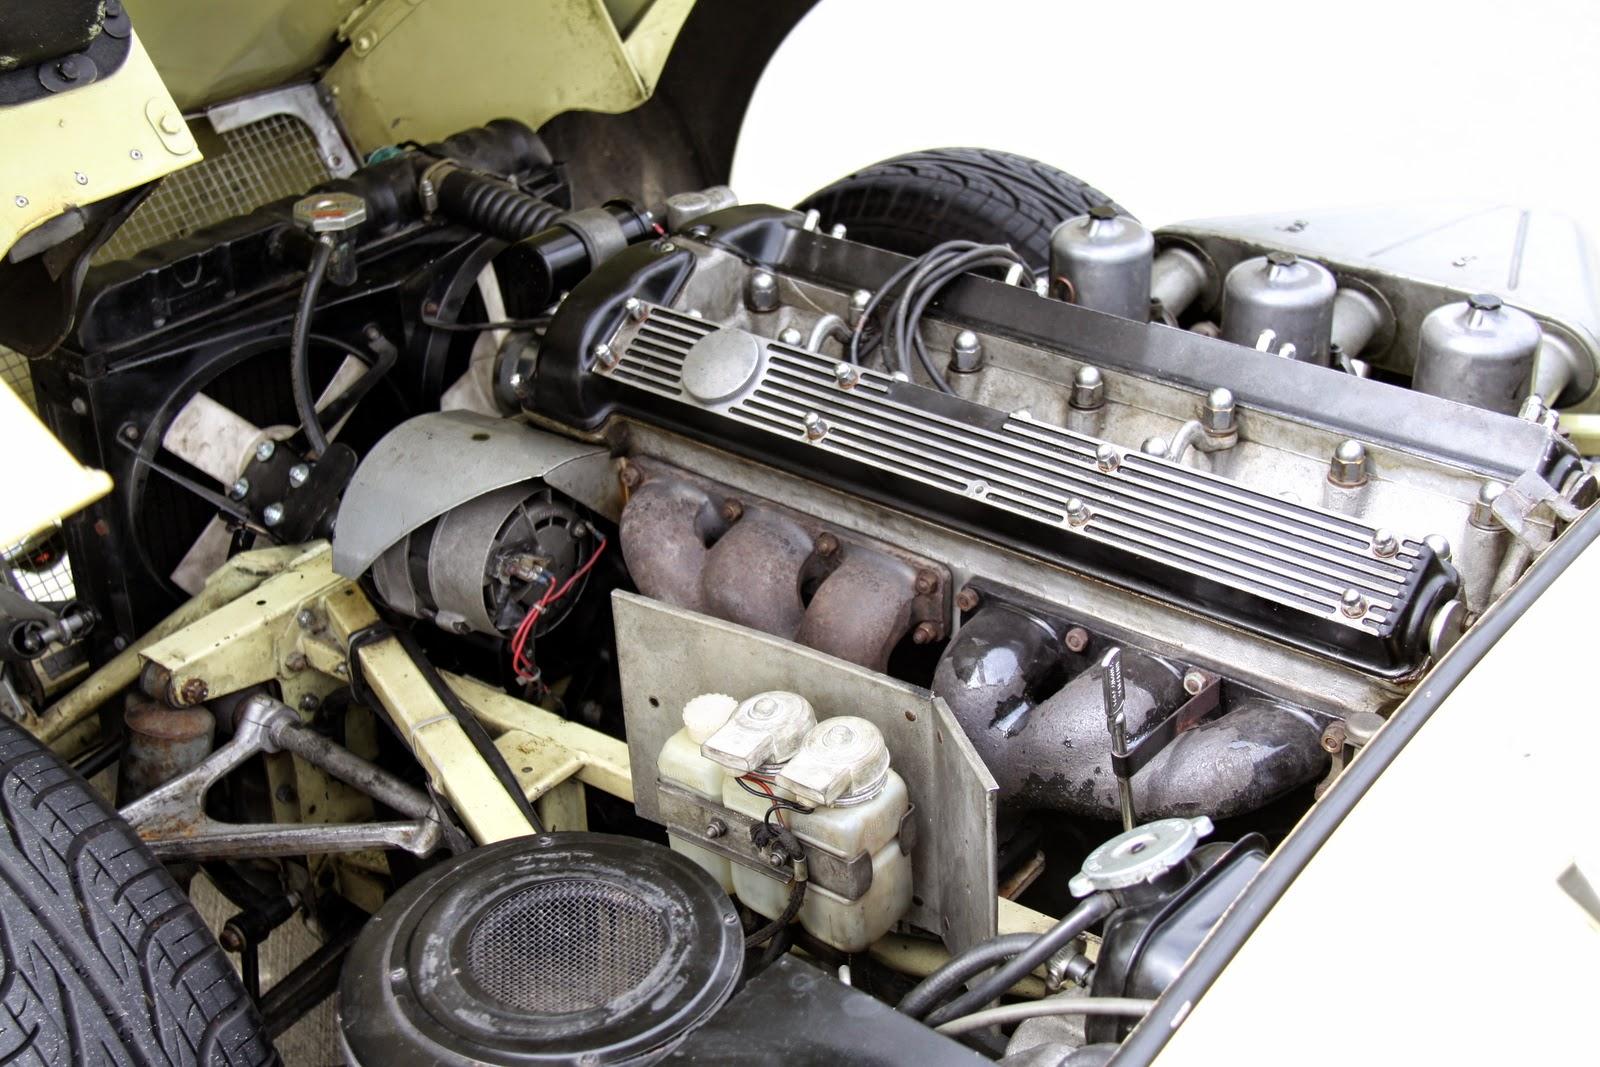 1968 jaguar e type rdstr series 1.5